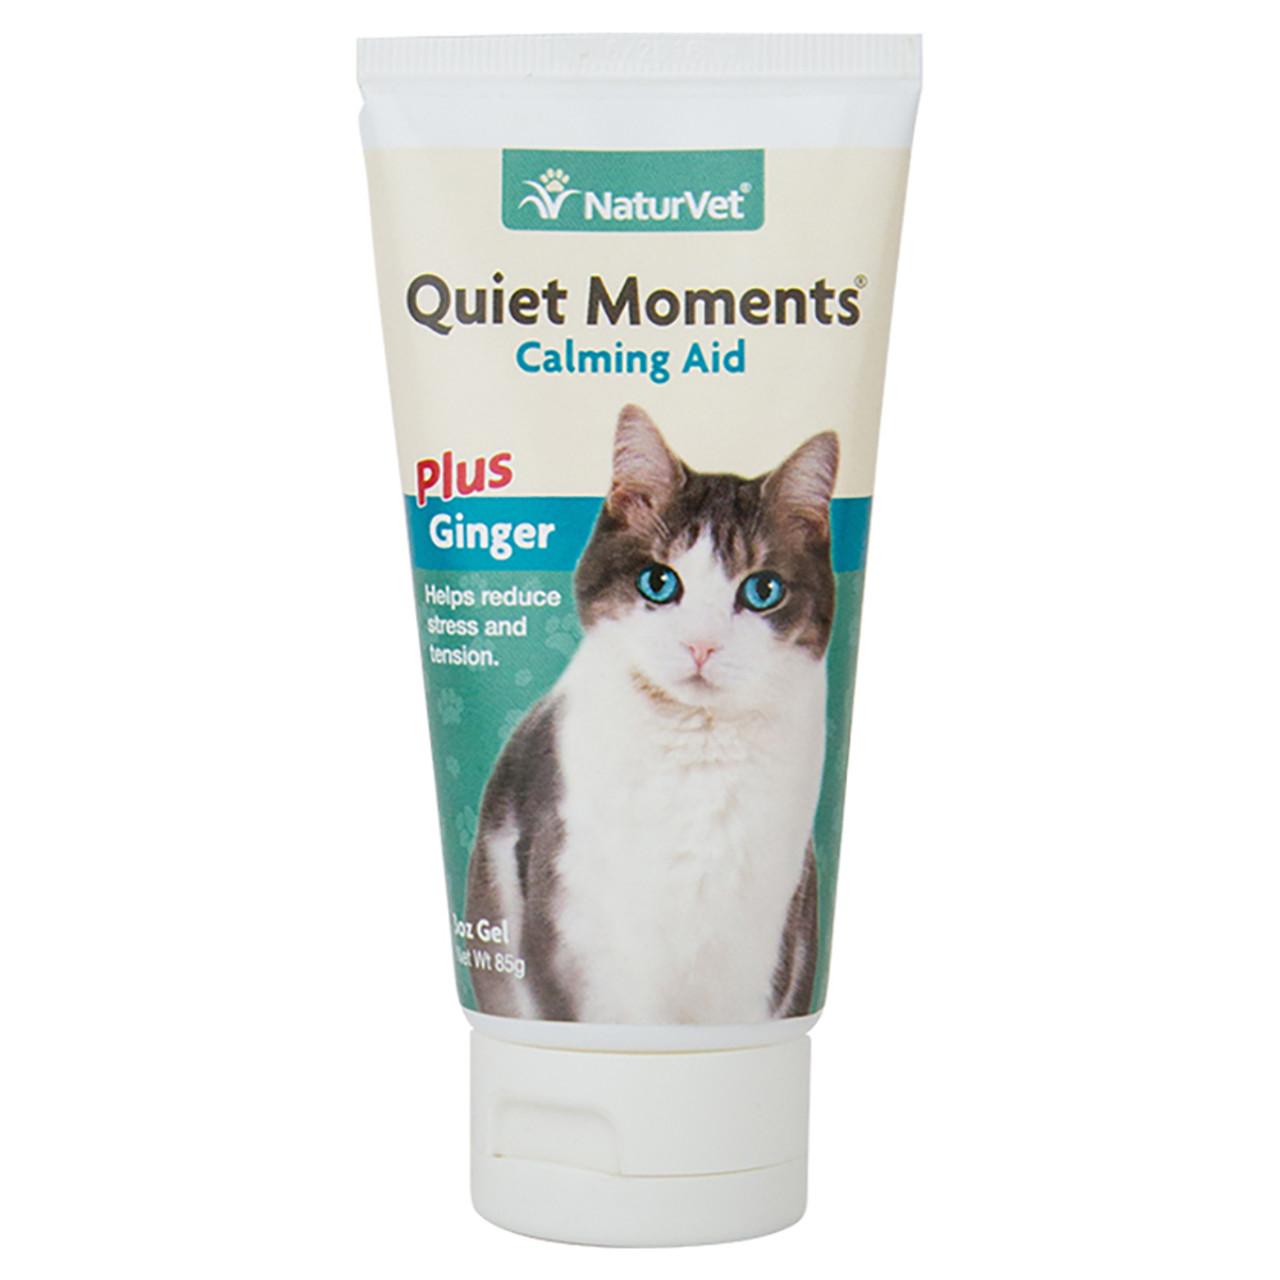 NaturVet Quiet Moments Calming Gel for Cats